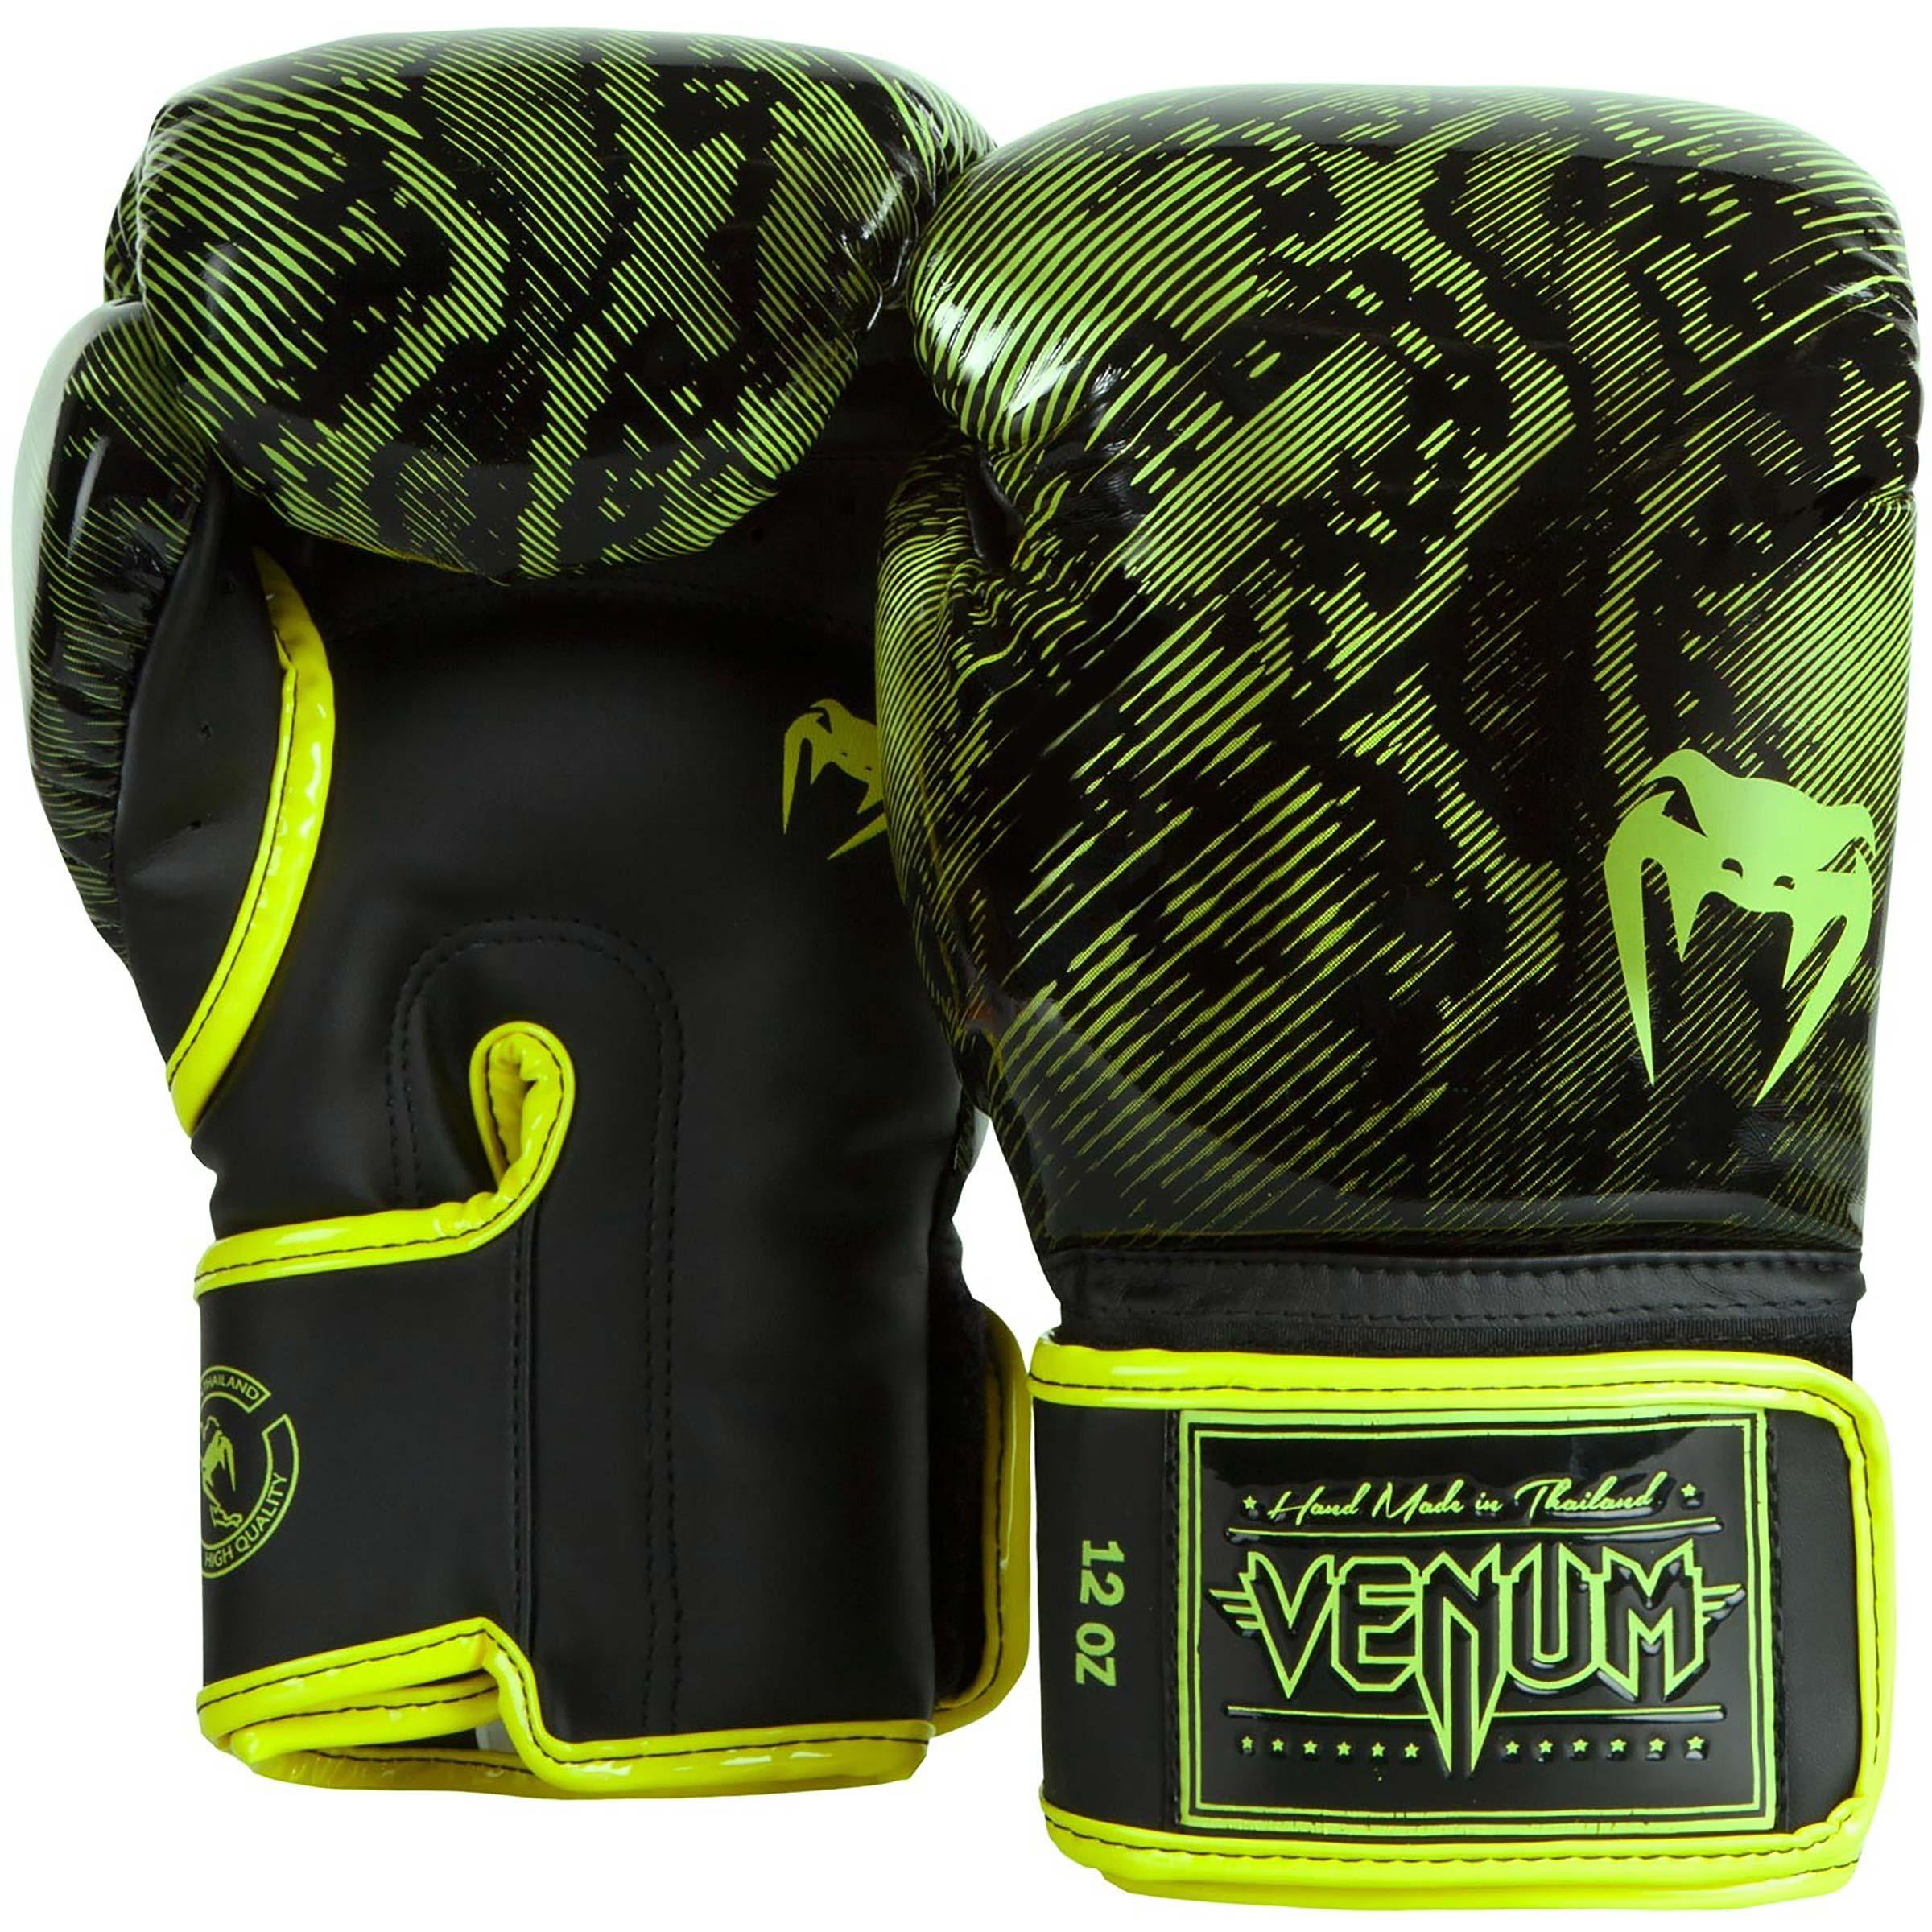 Venum Fusion Boxing Gloves Martial Arts Muay Thai MMA Neo Yellow